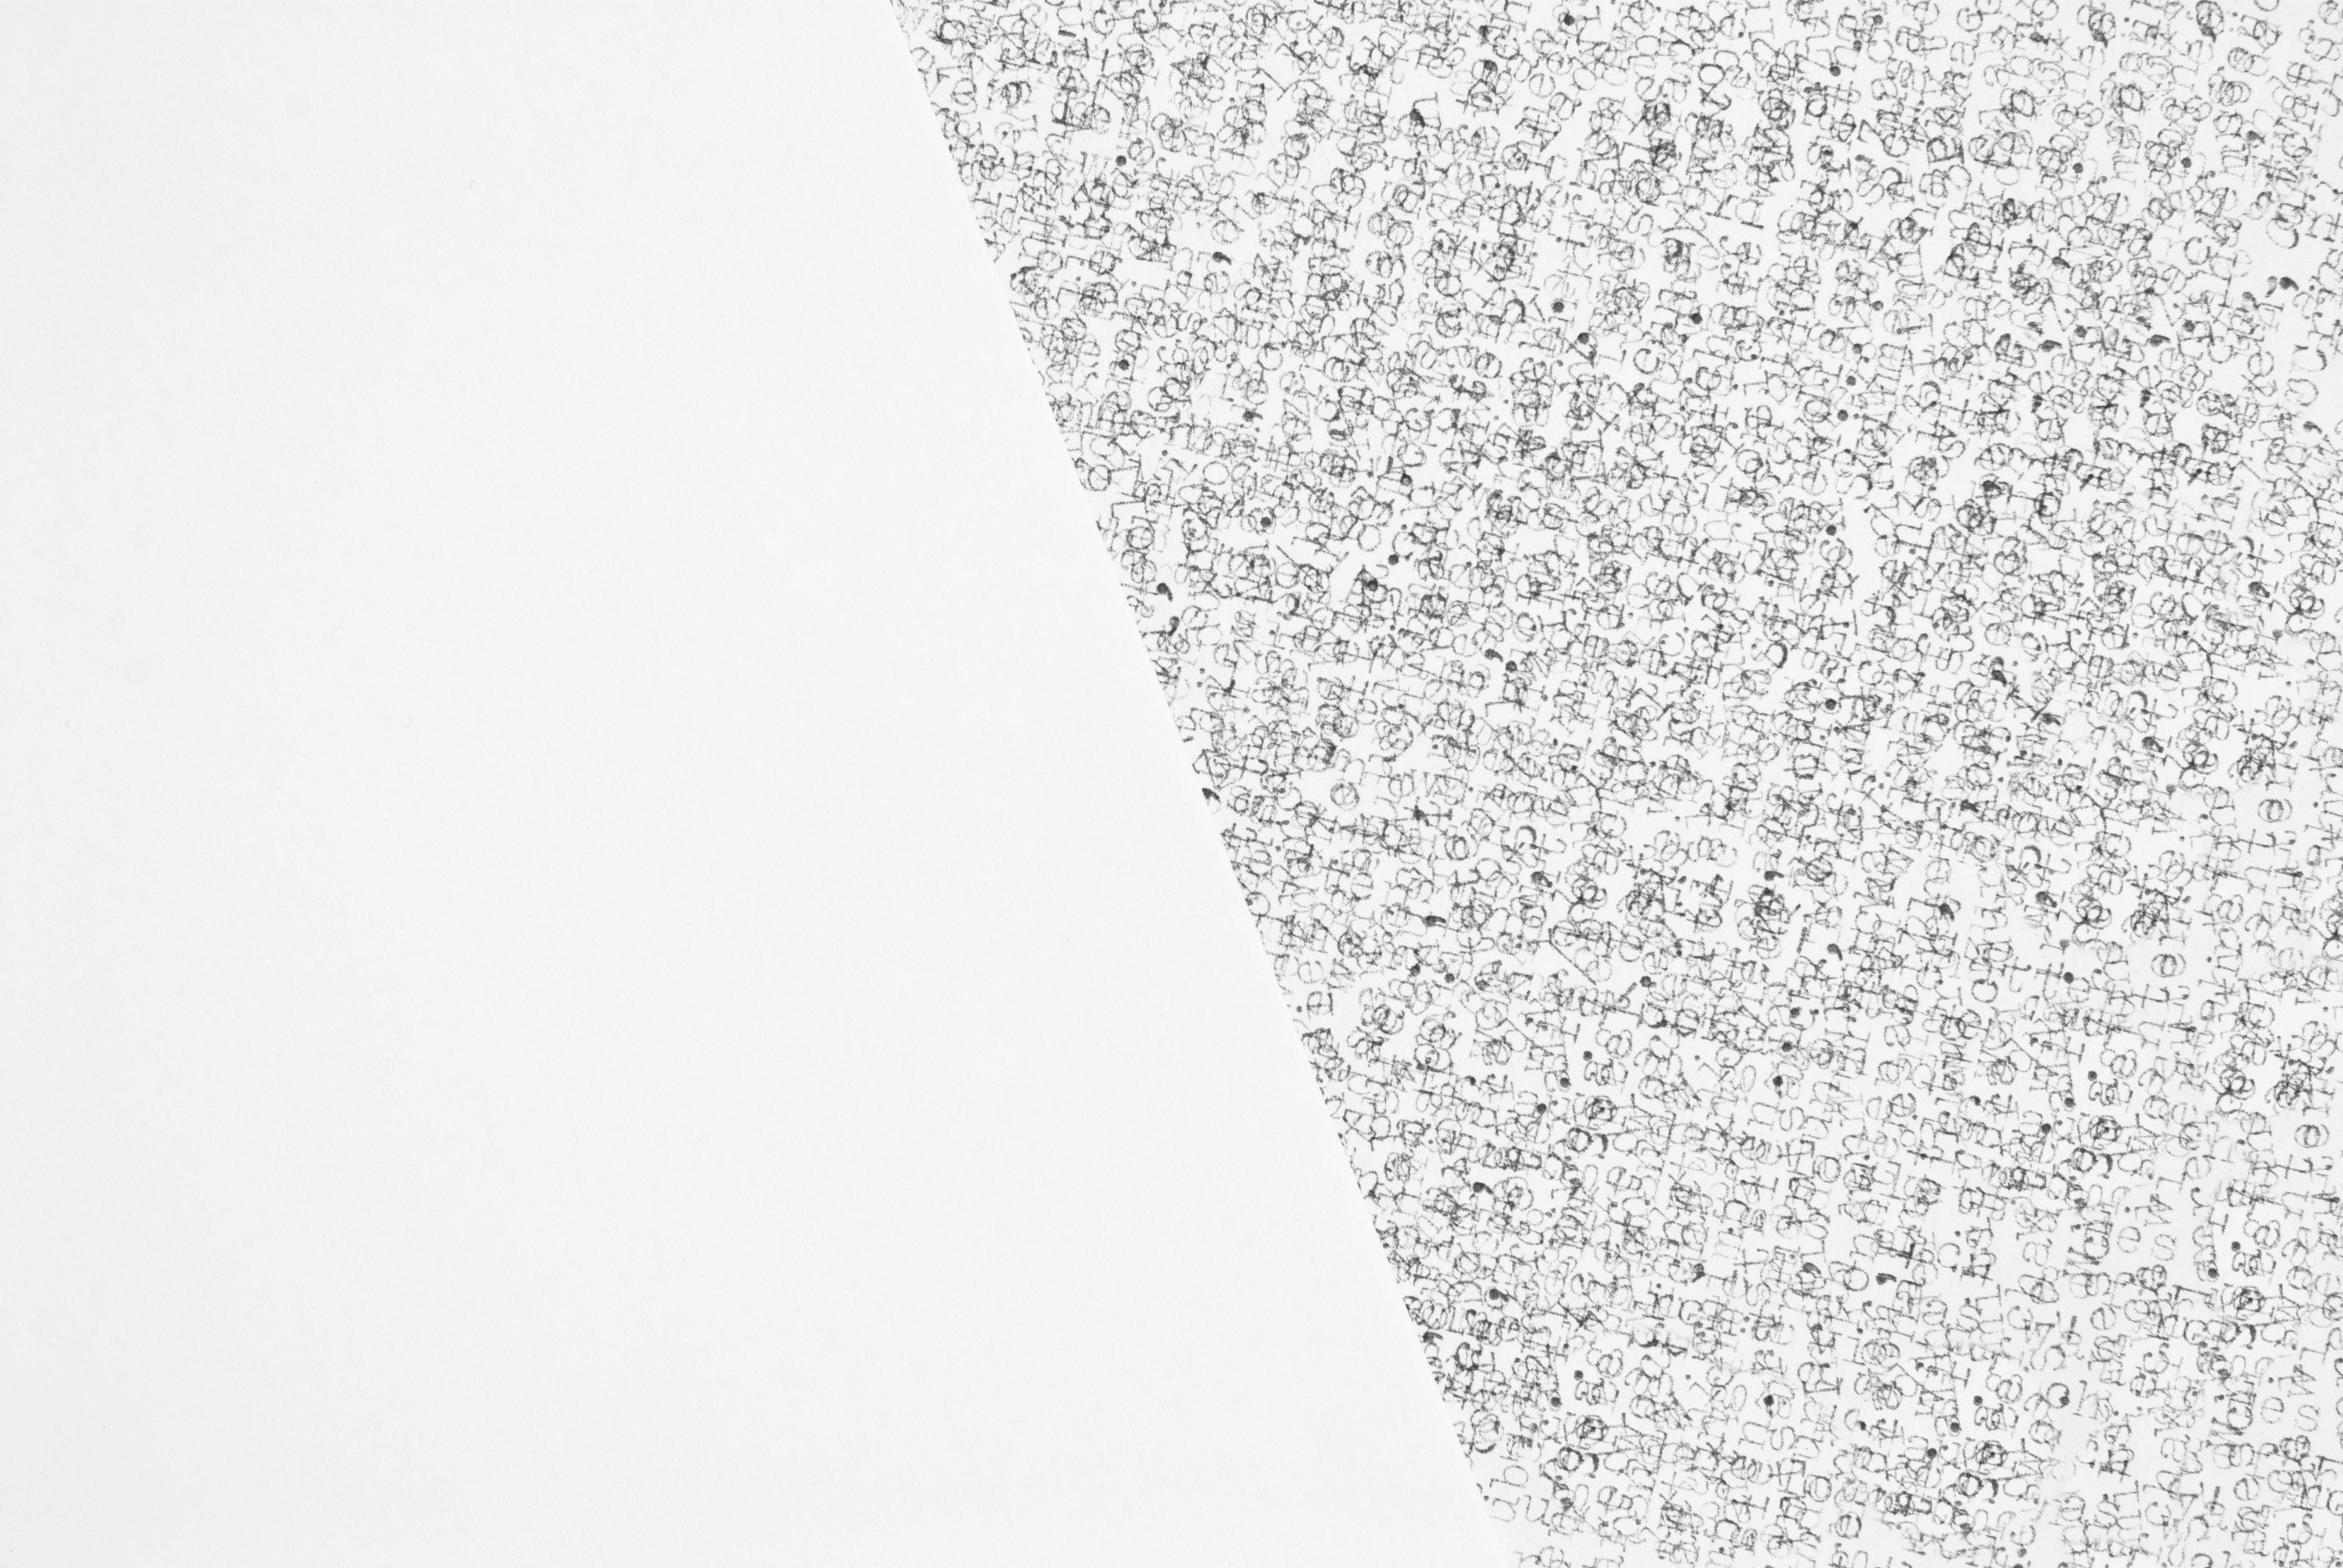 Papierblatt symbolbild bewerbungsmappencheck.96a51b7cee9caf1c0ad95e4b61b2be88f